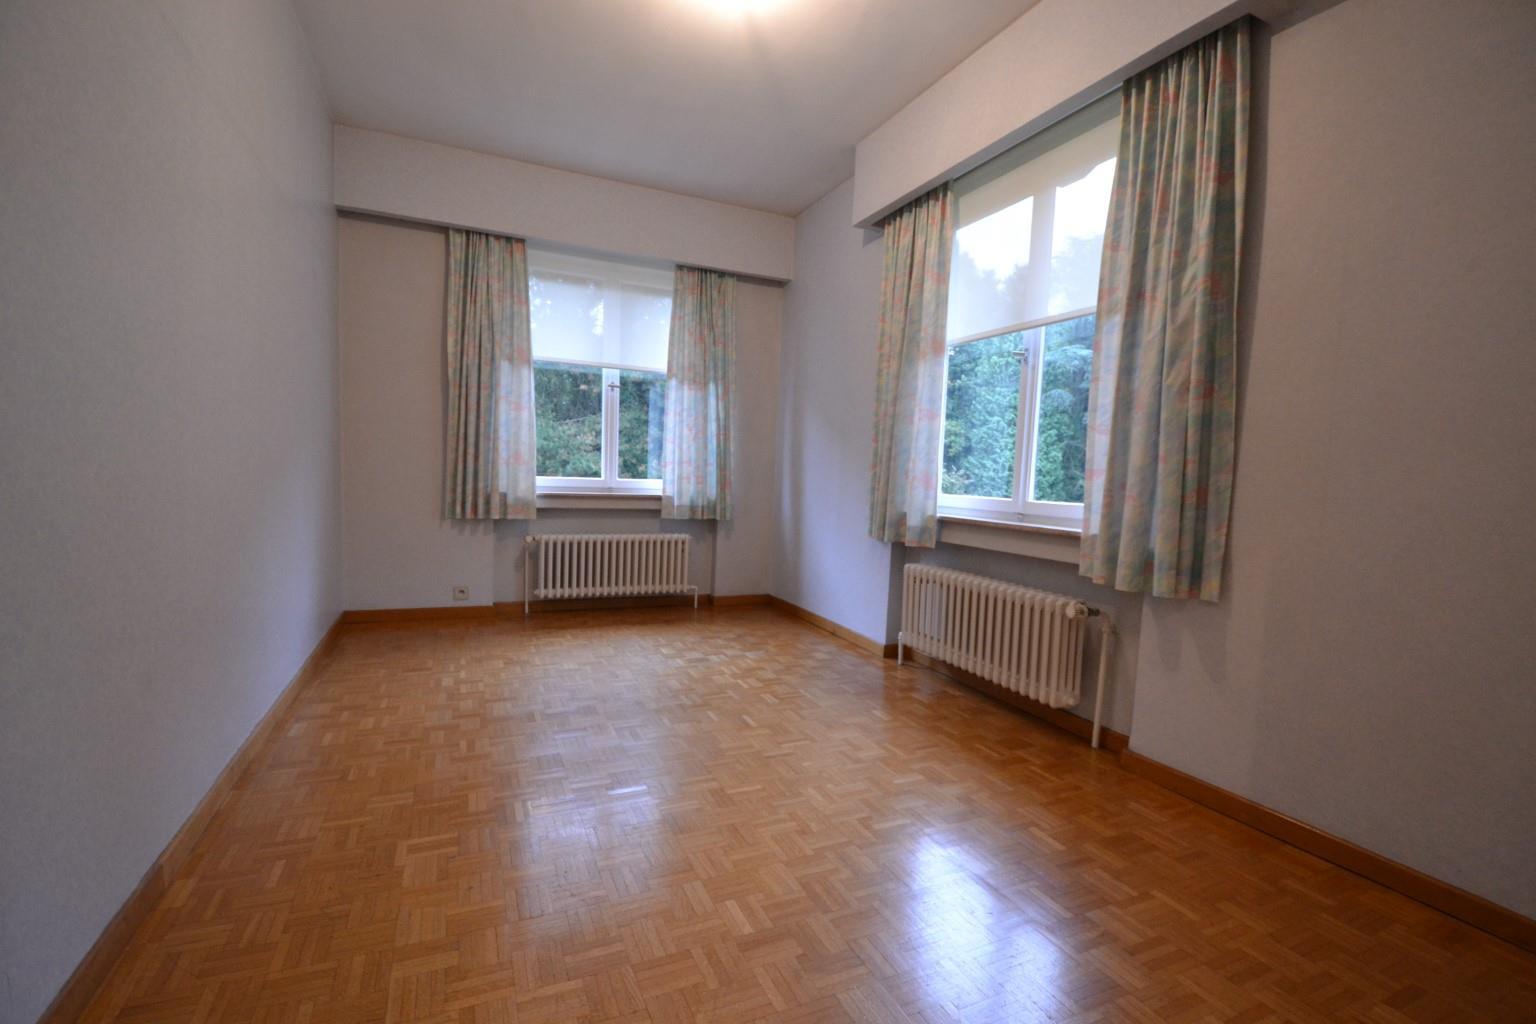 Huis - Bruxelles - #2815834-20